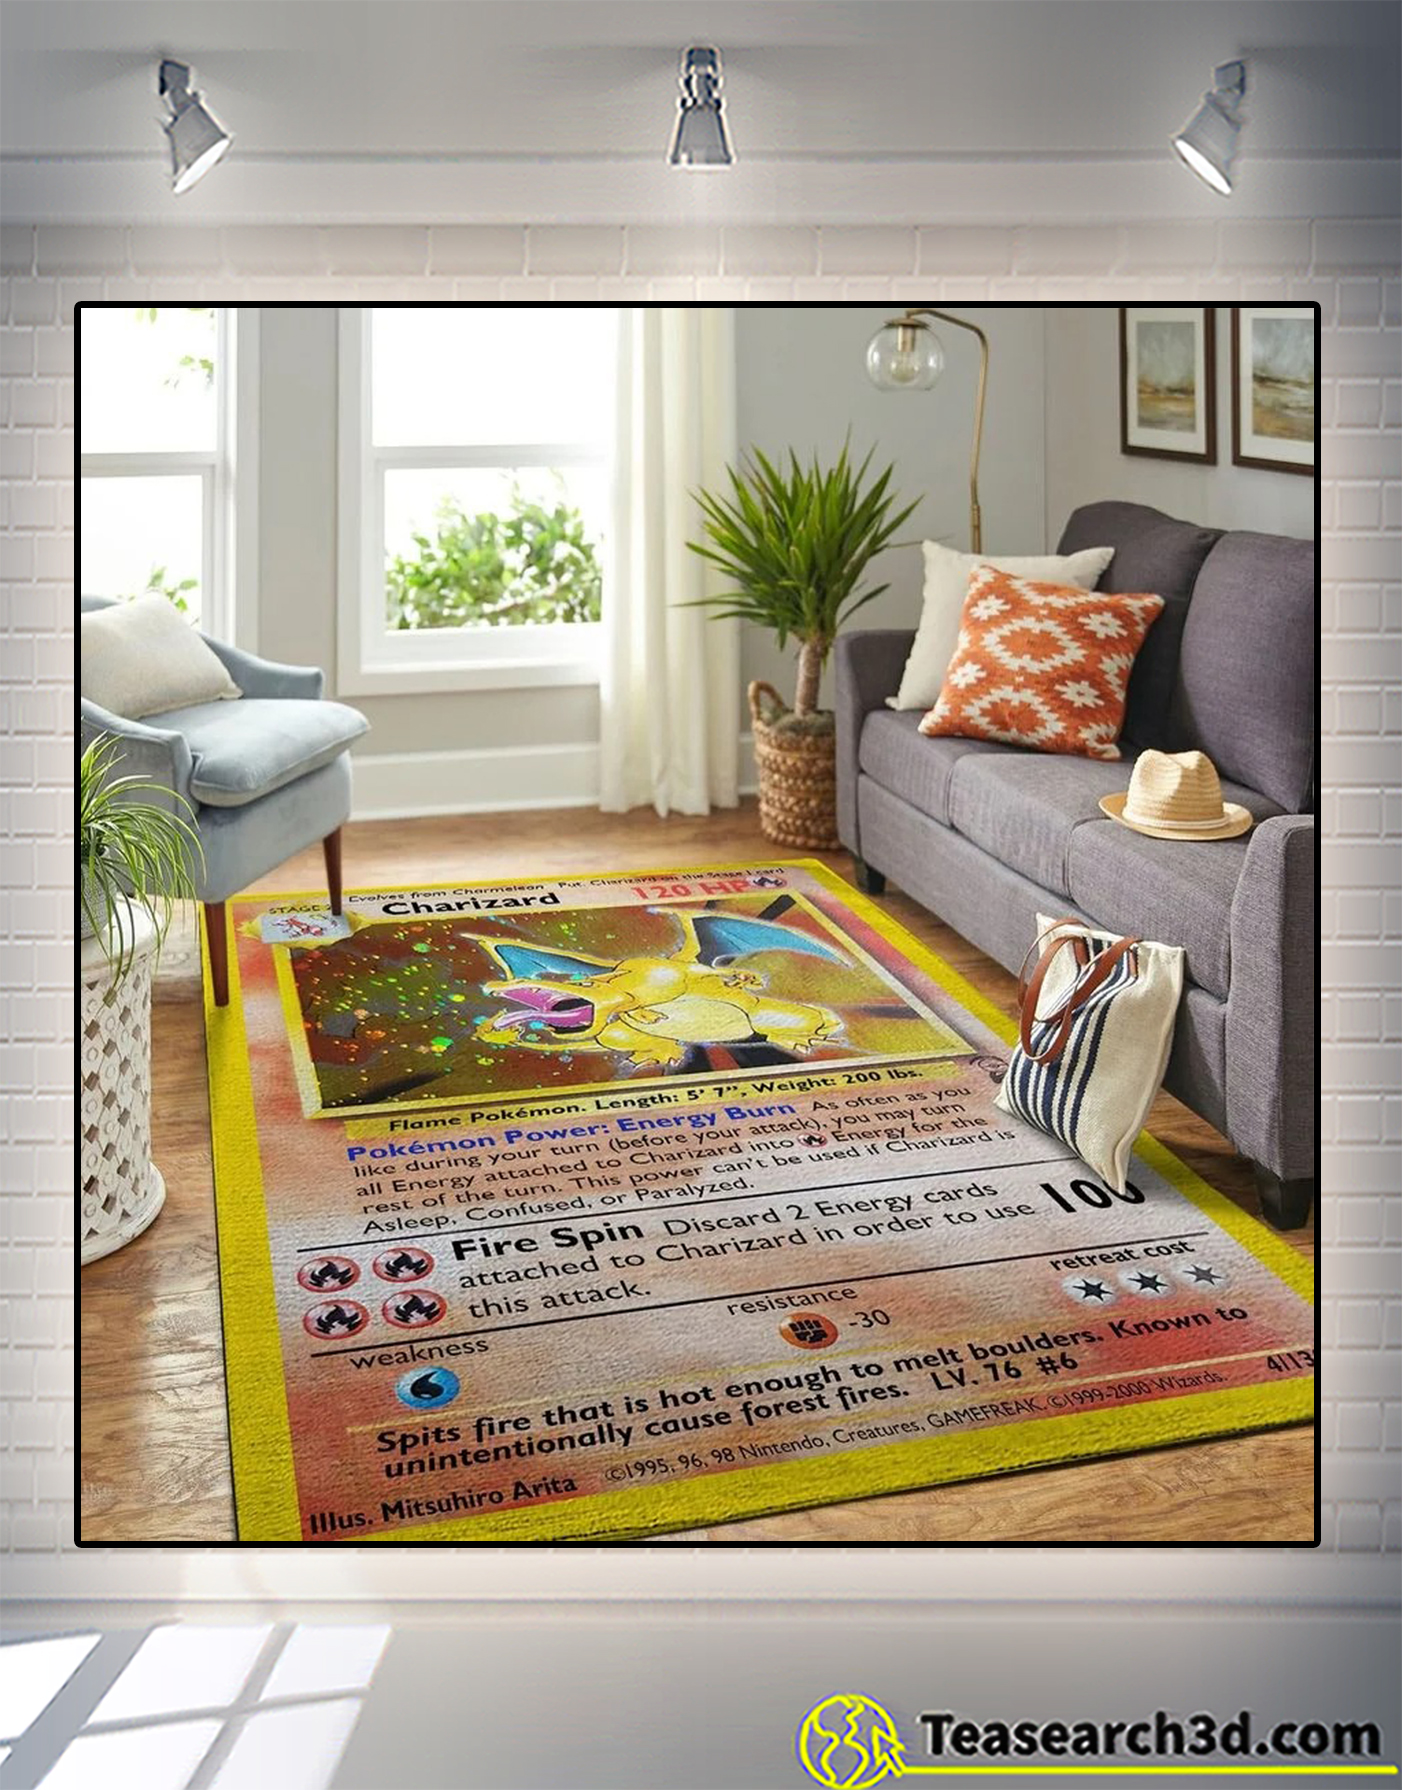 Charizard pokemon card rug 2